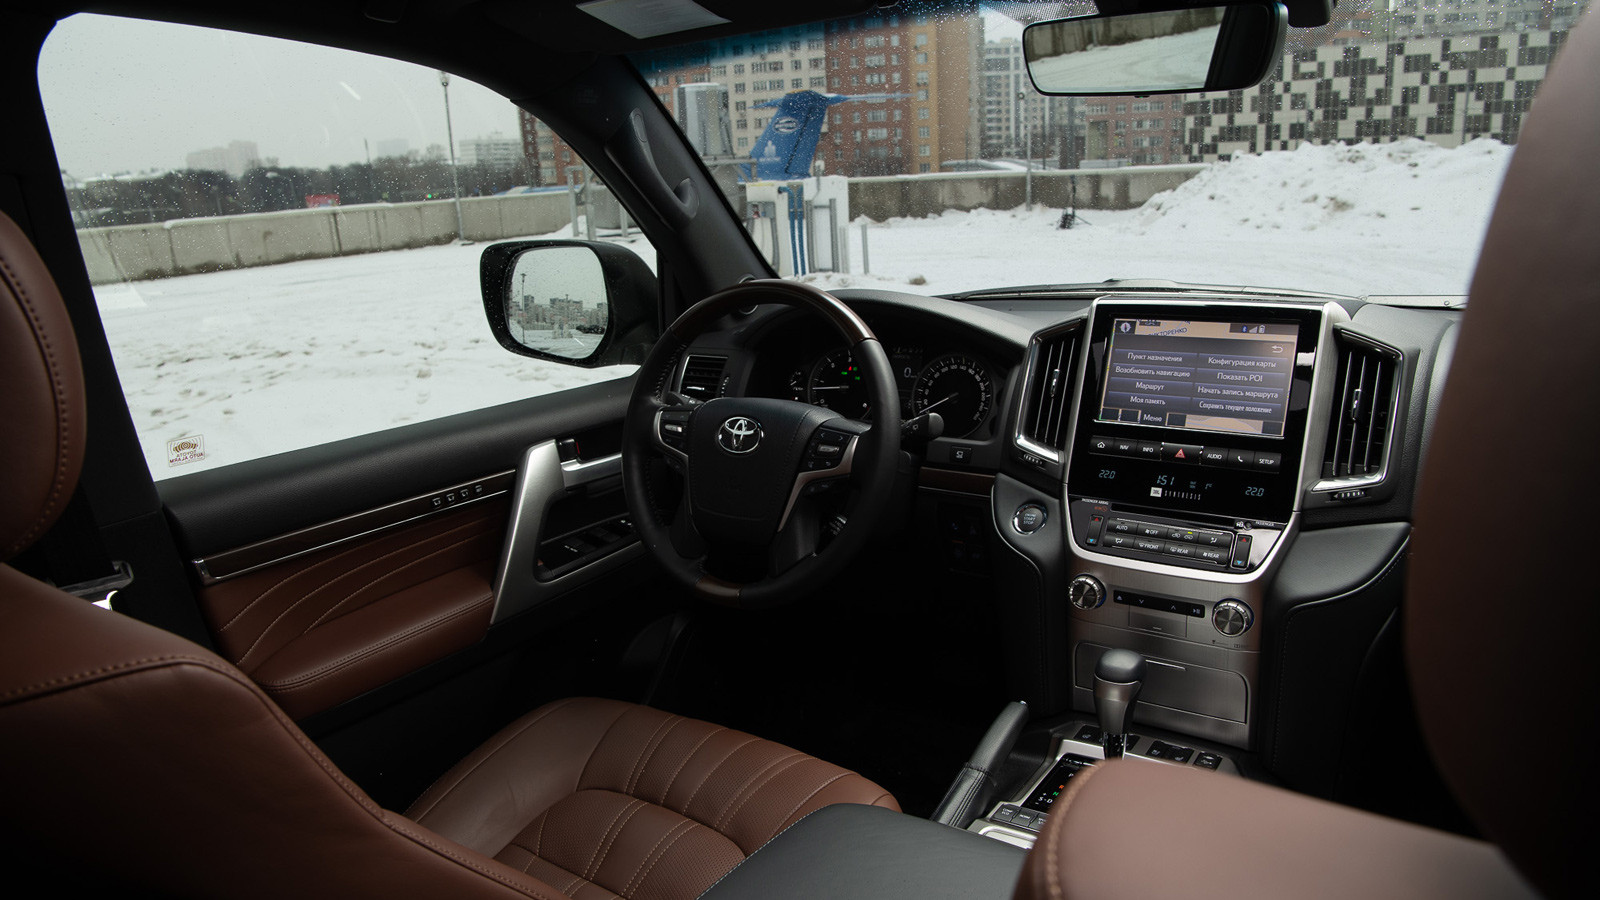 001-lc200-interior-winter_1600x900_tcm-3